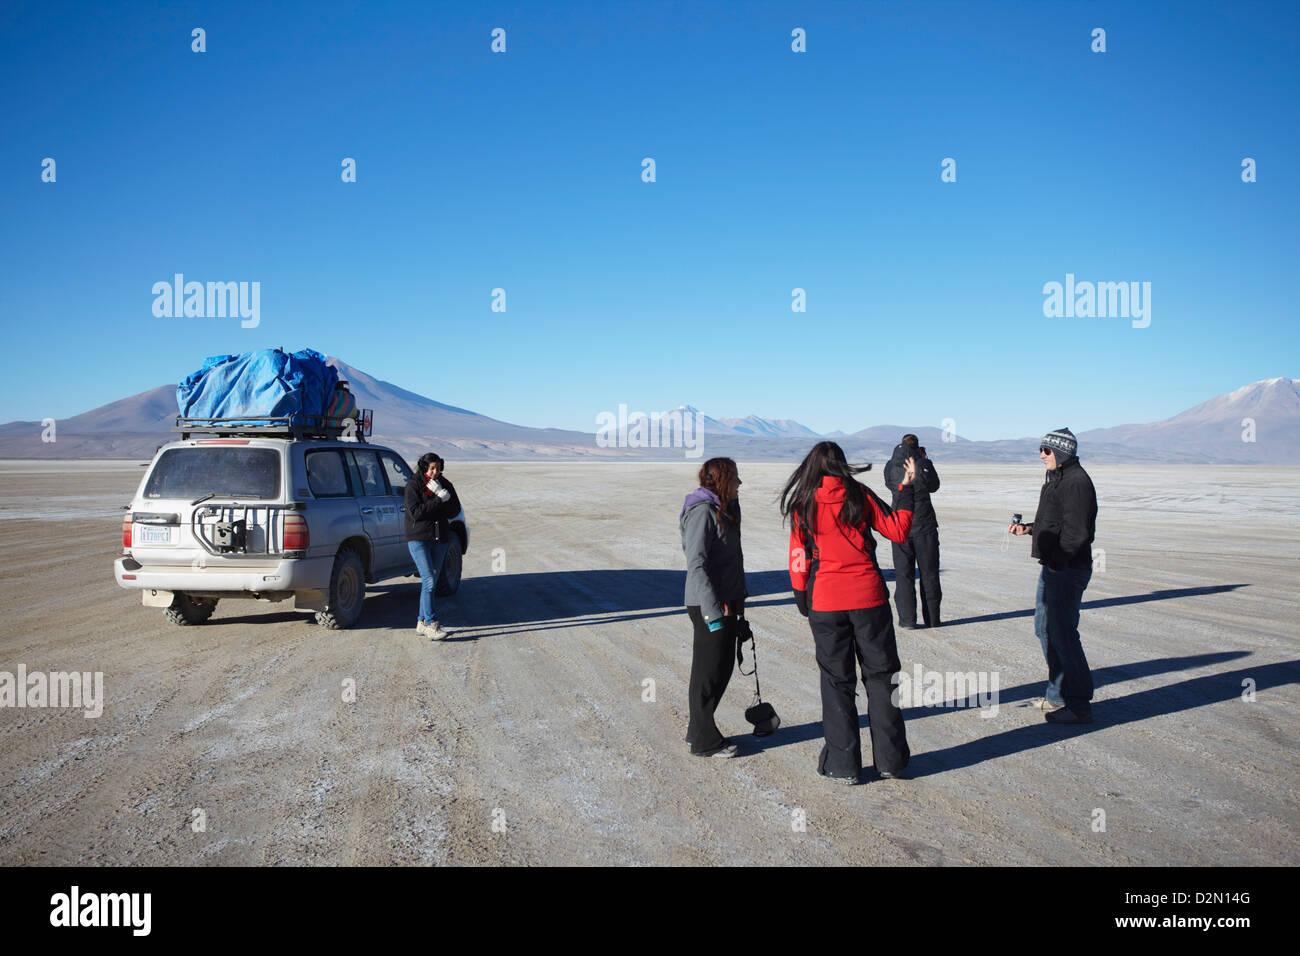 Tourists and jeep on Altiplano, Potosi Department, Bolivia, South America - Stock Image